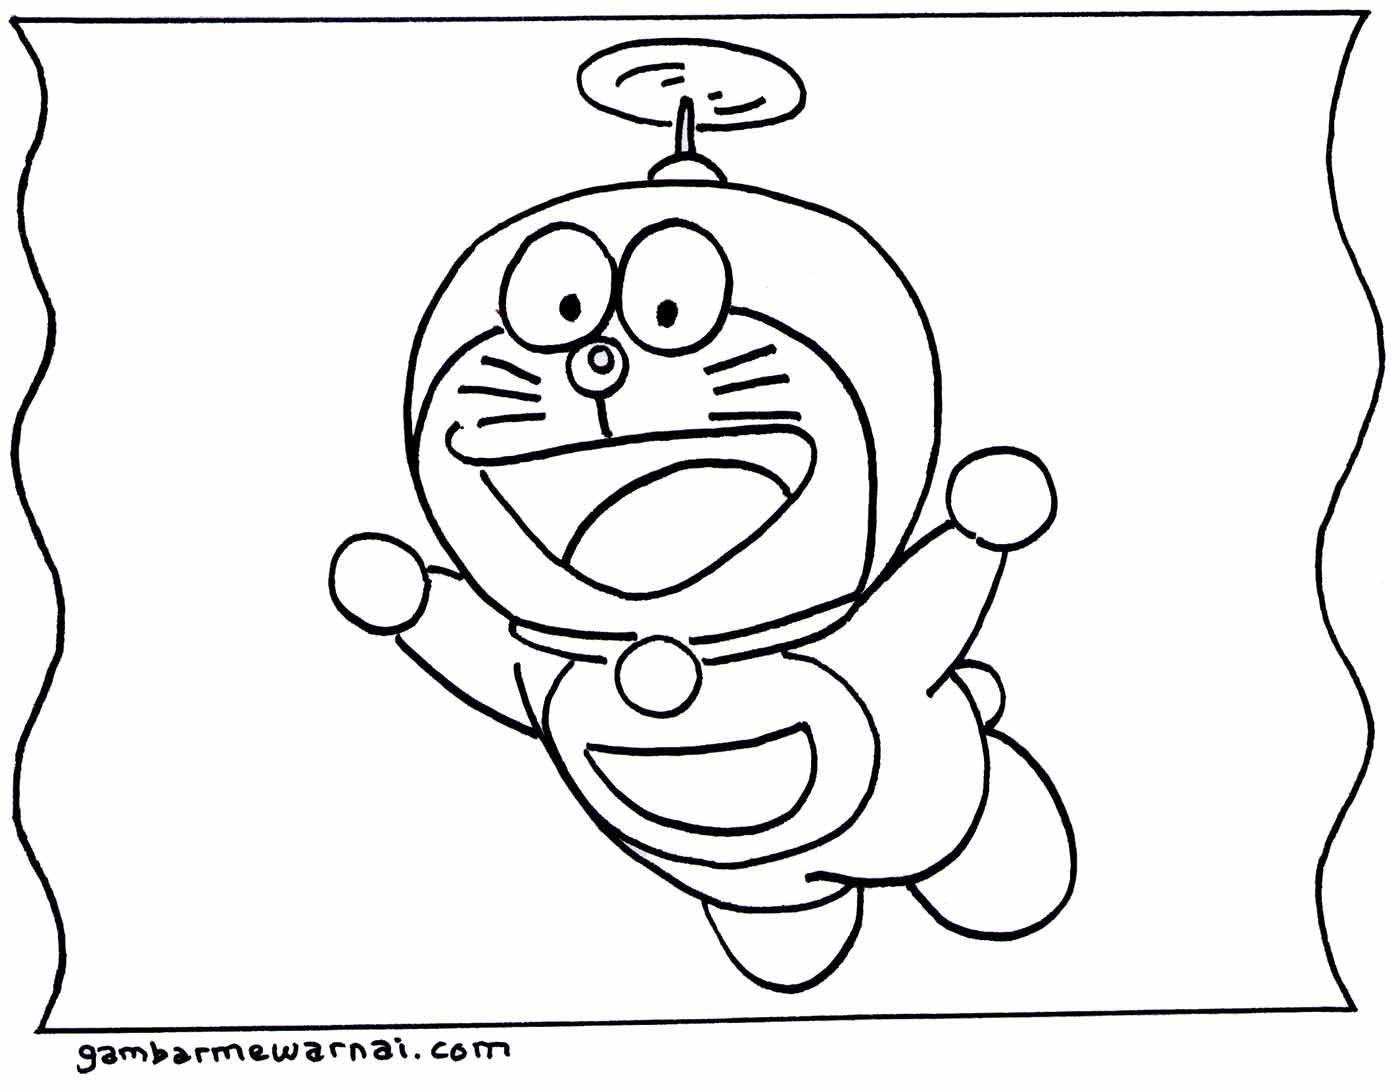 Gambar Mewarnai Doraemon Gambarmewarnai